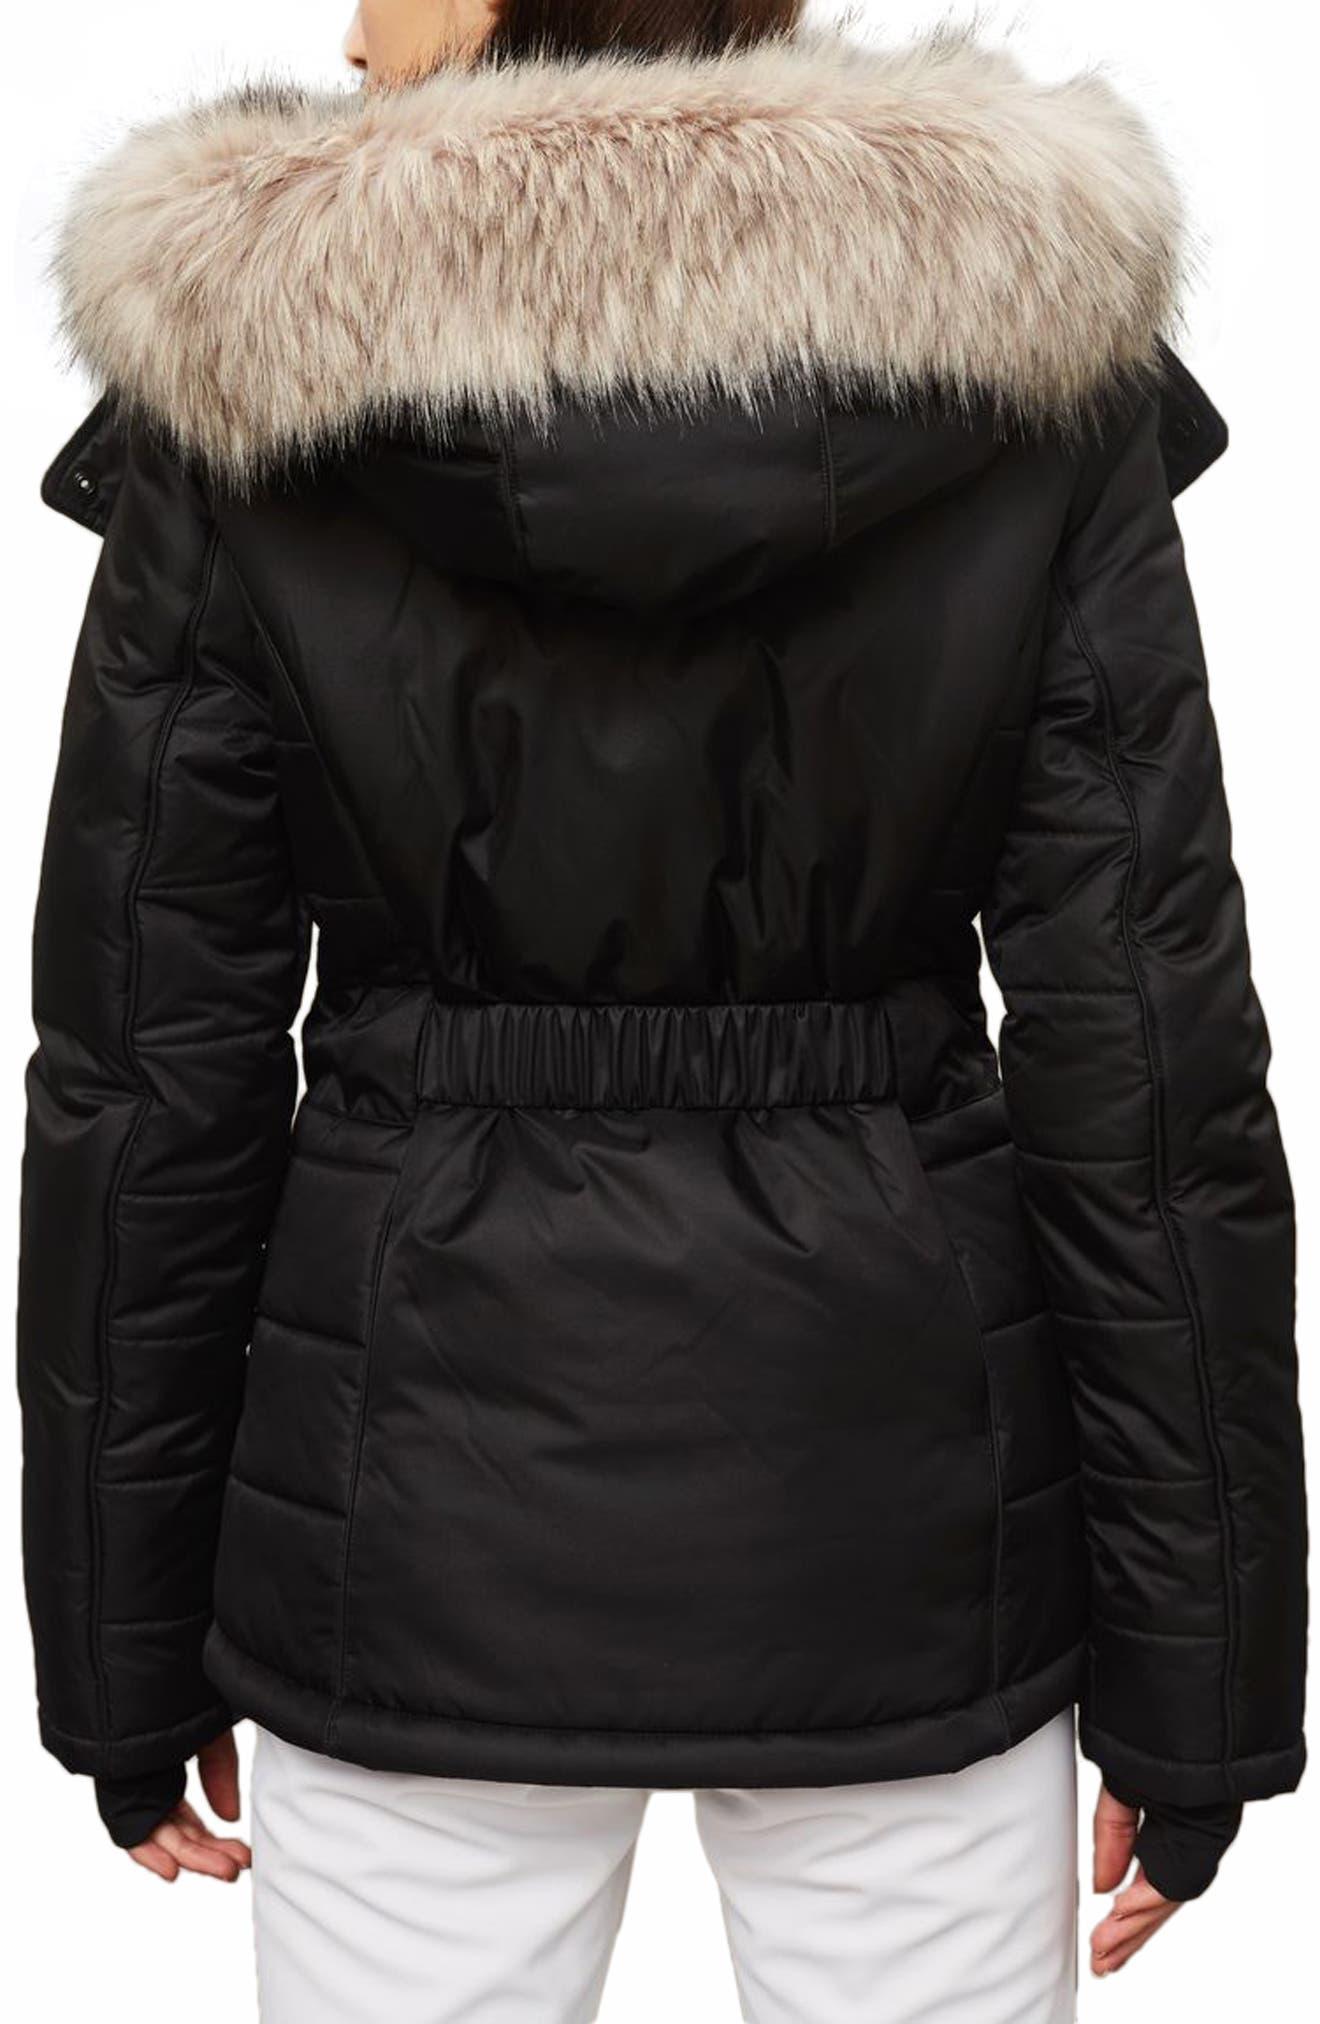 SNO Amazon Puffer Jacket,                             Alternate thumbnail 2, color,                             Black